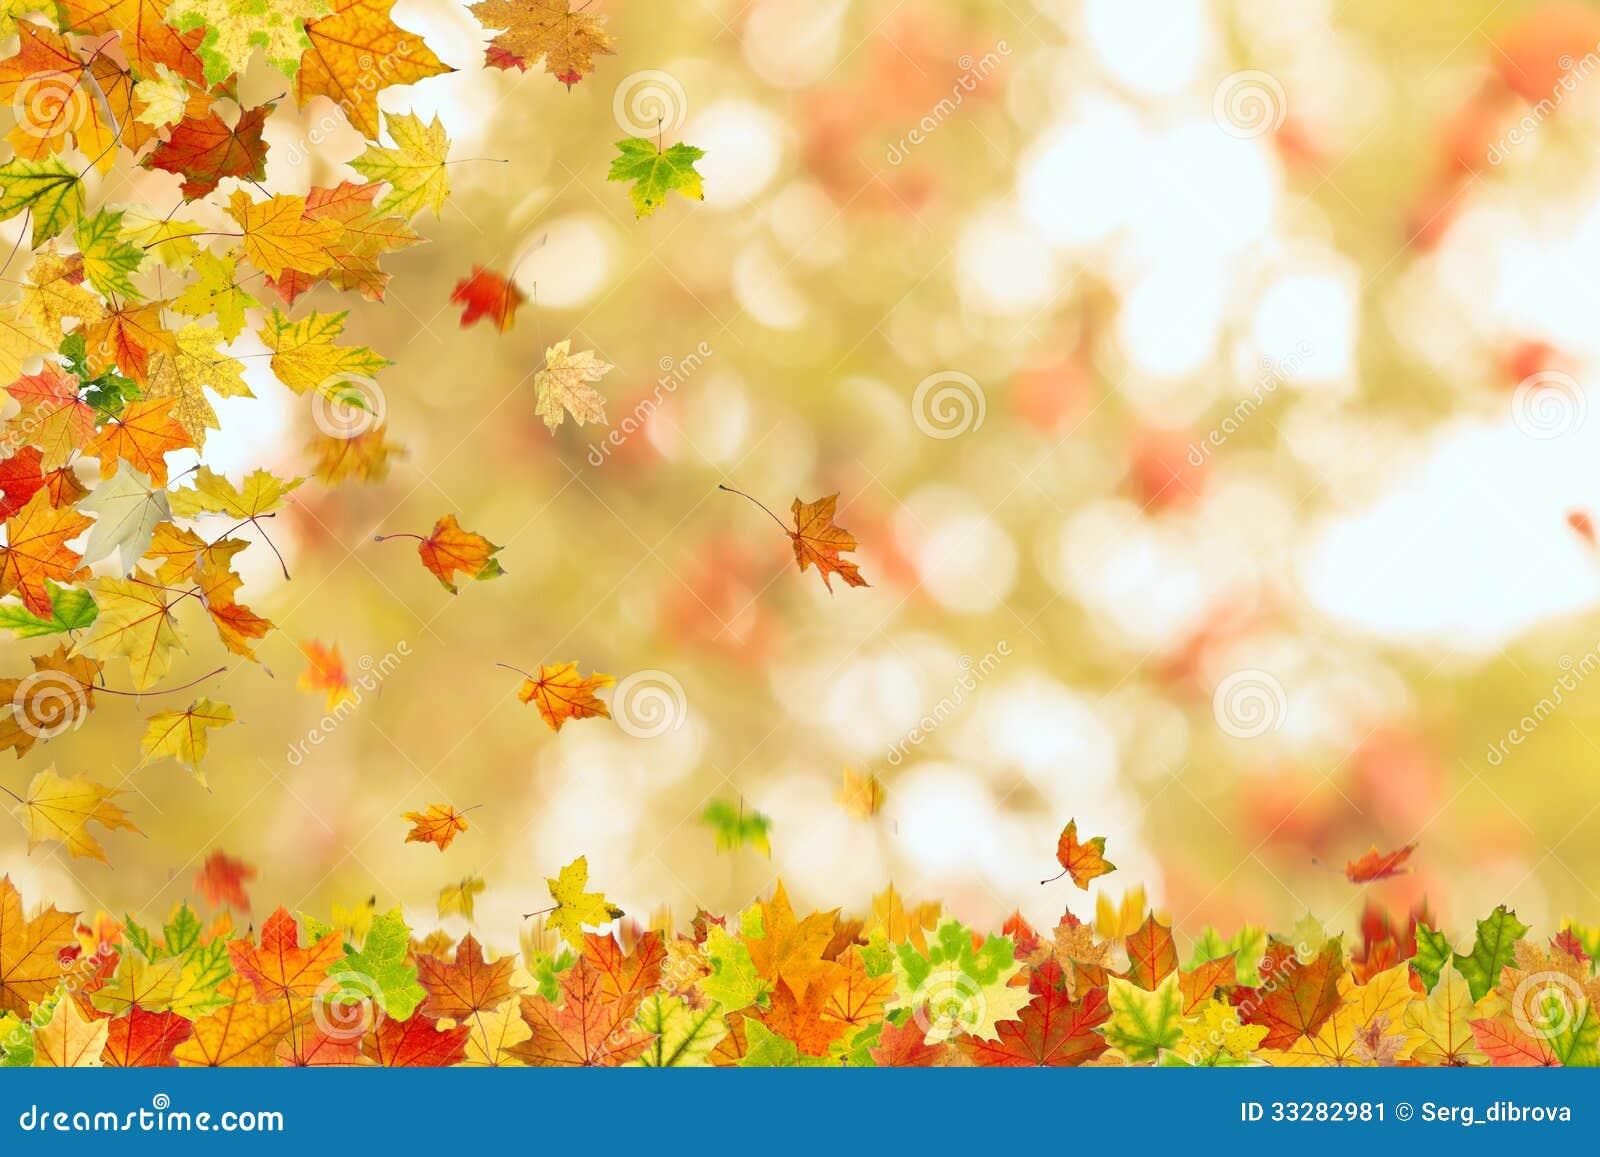 Autumn Maple Leaves Falling Stock Image Image 33282981